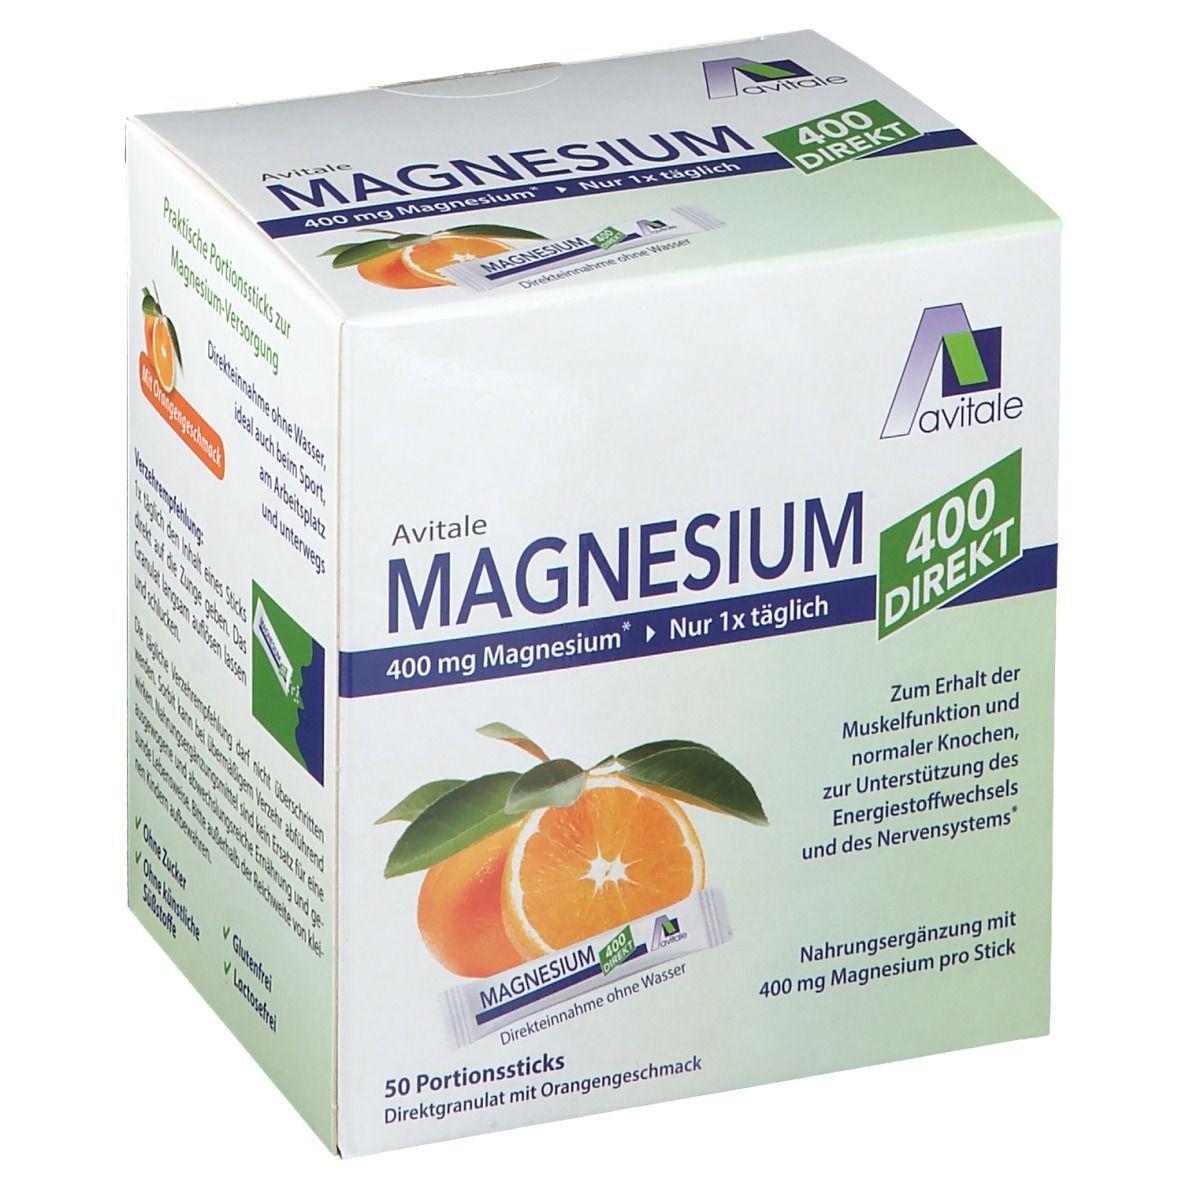 Avitale Magnesium 400 DIREKT